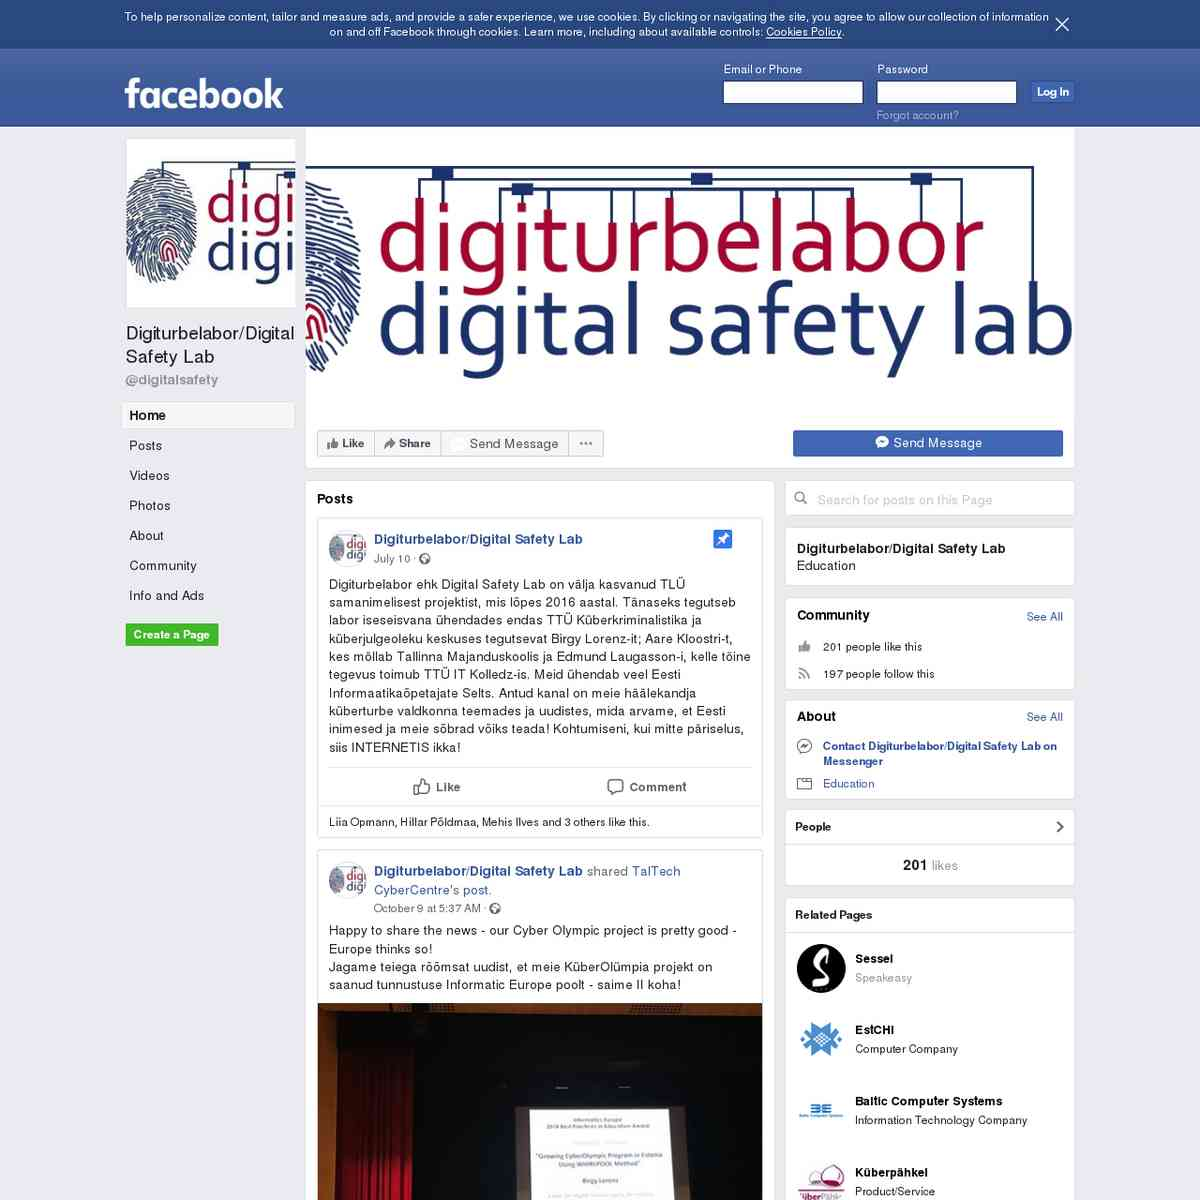 Digiturbelabor/Digital Safety Lab